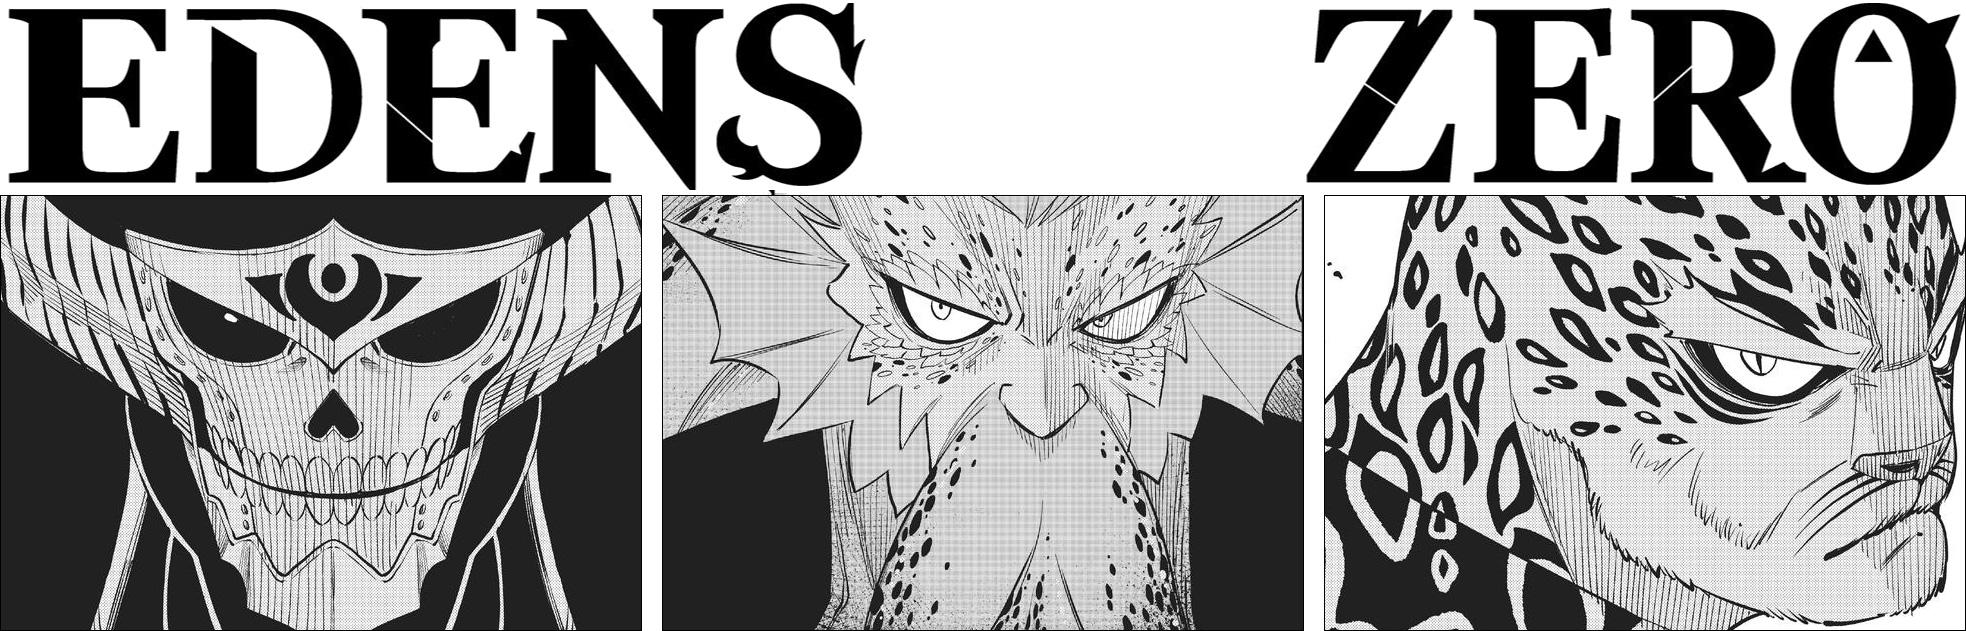 Edens Zero chapter 156 - Ziggy, Nero and Jaguar face off